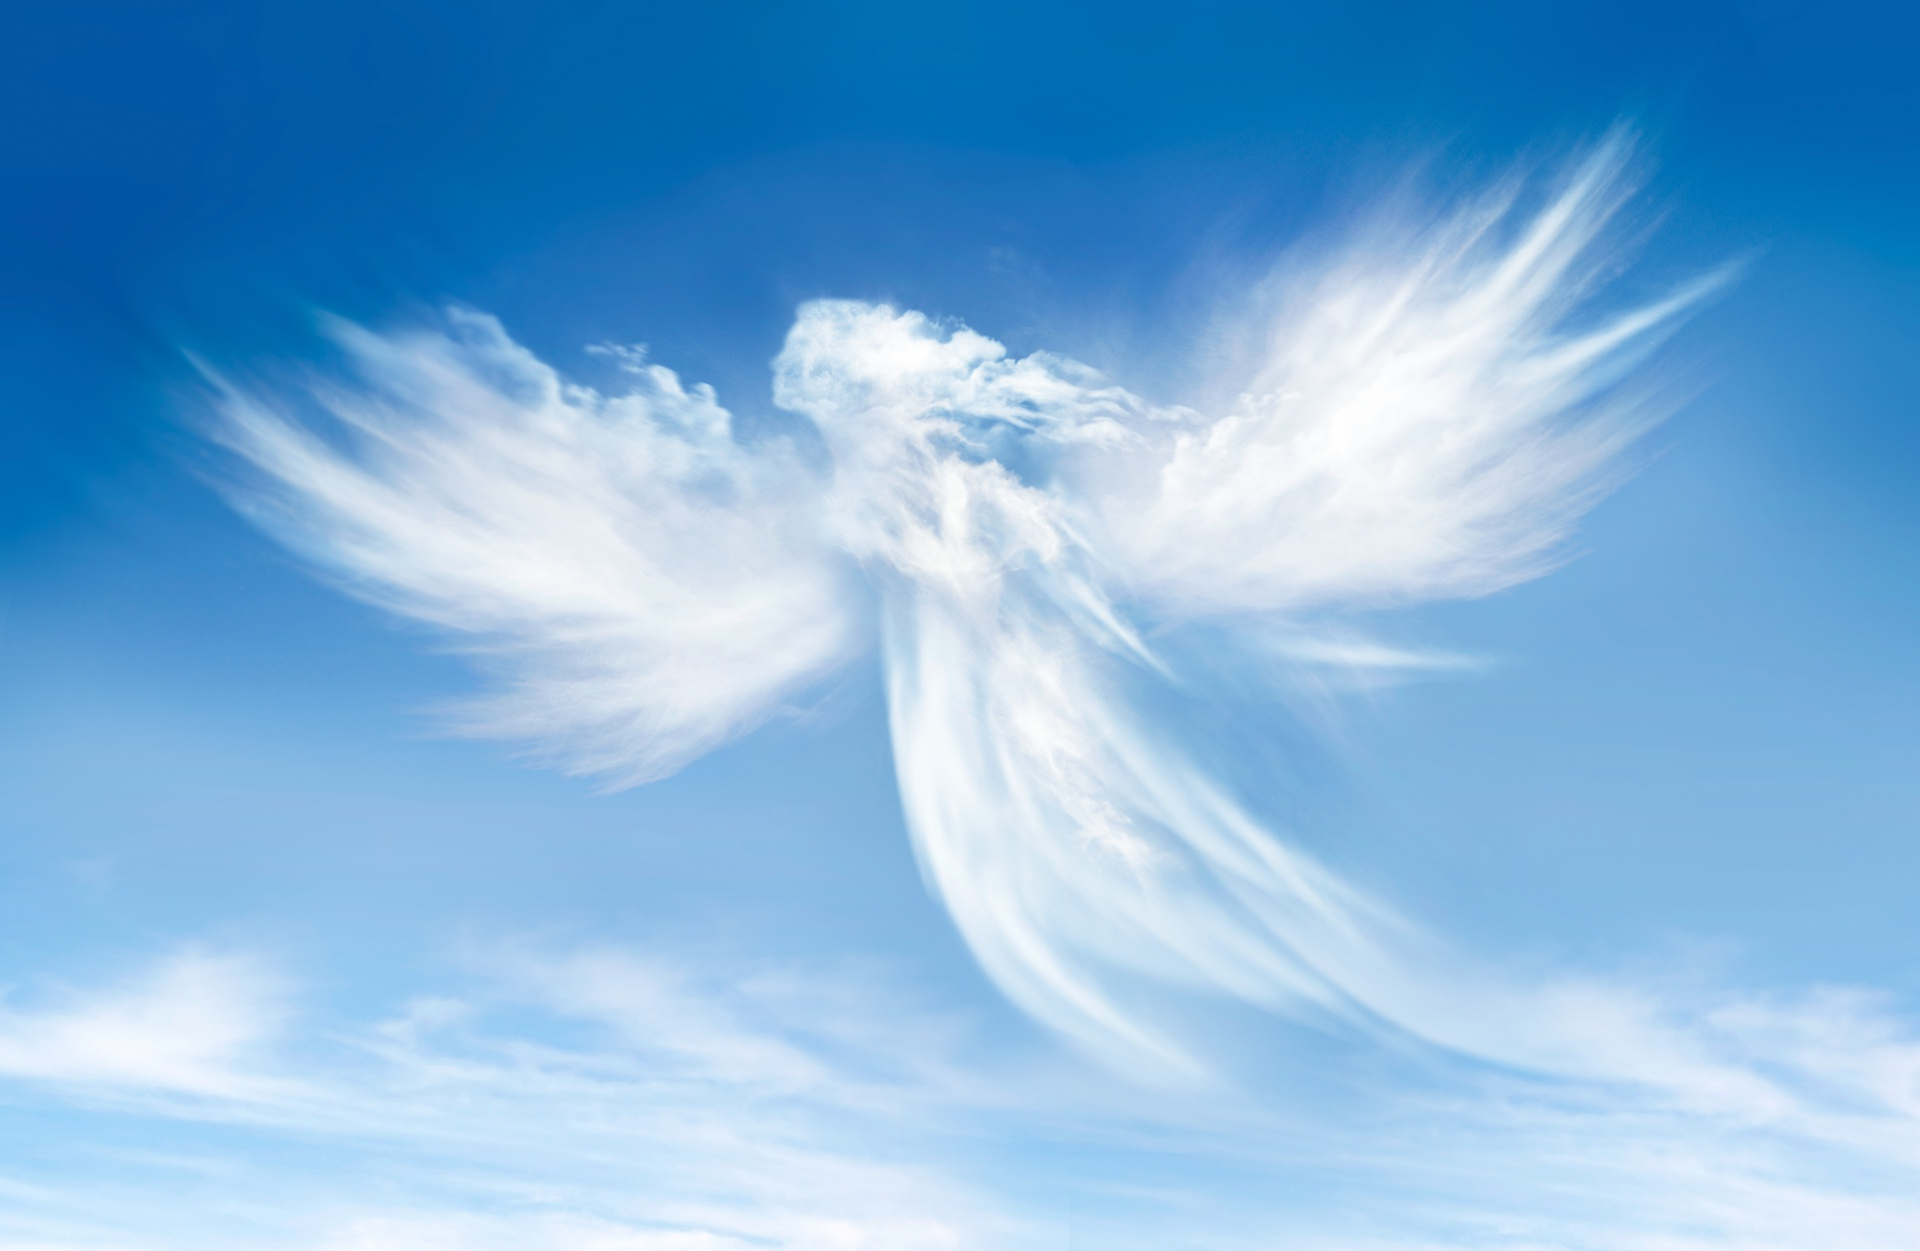 Engel Wolken im Himmel